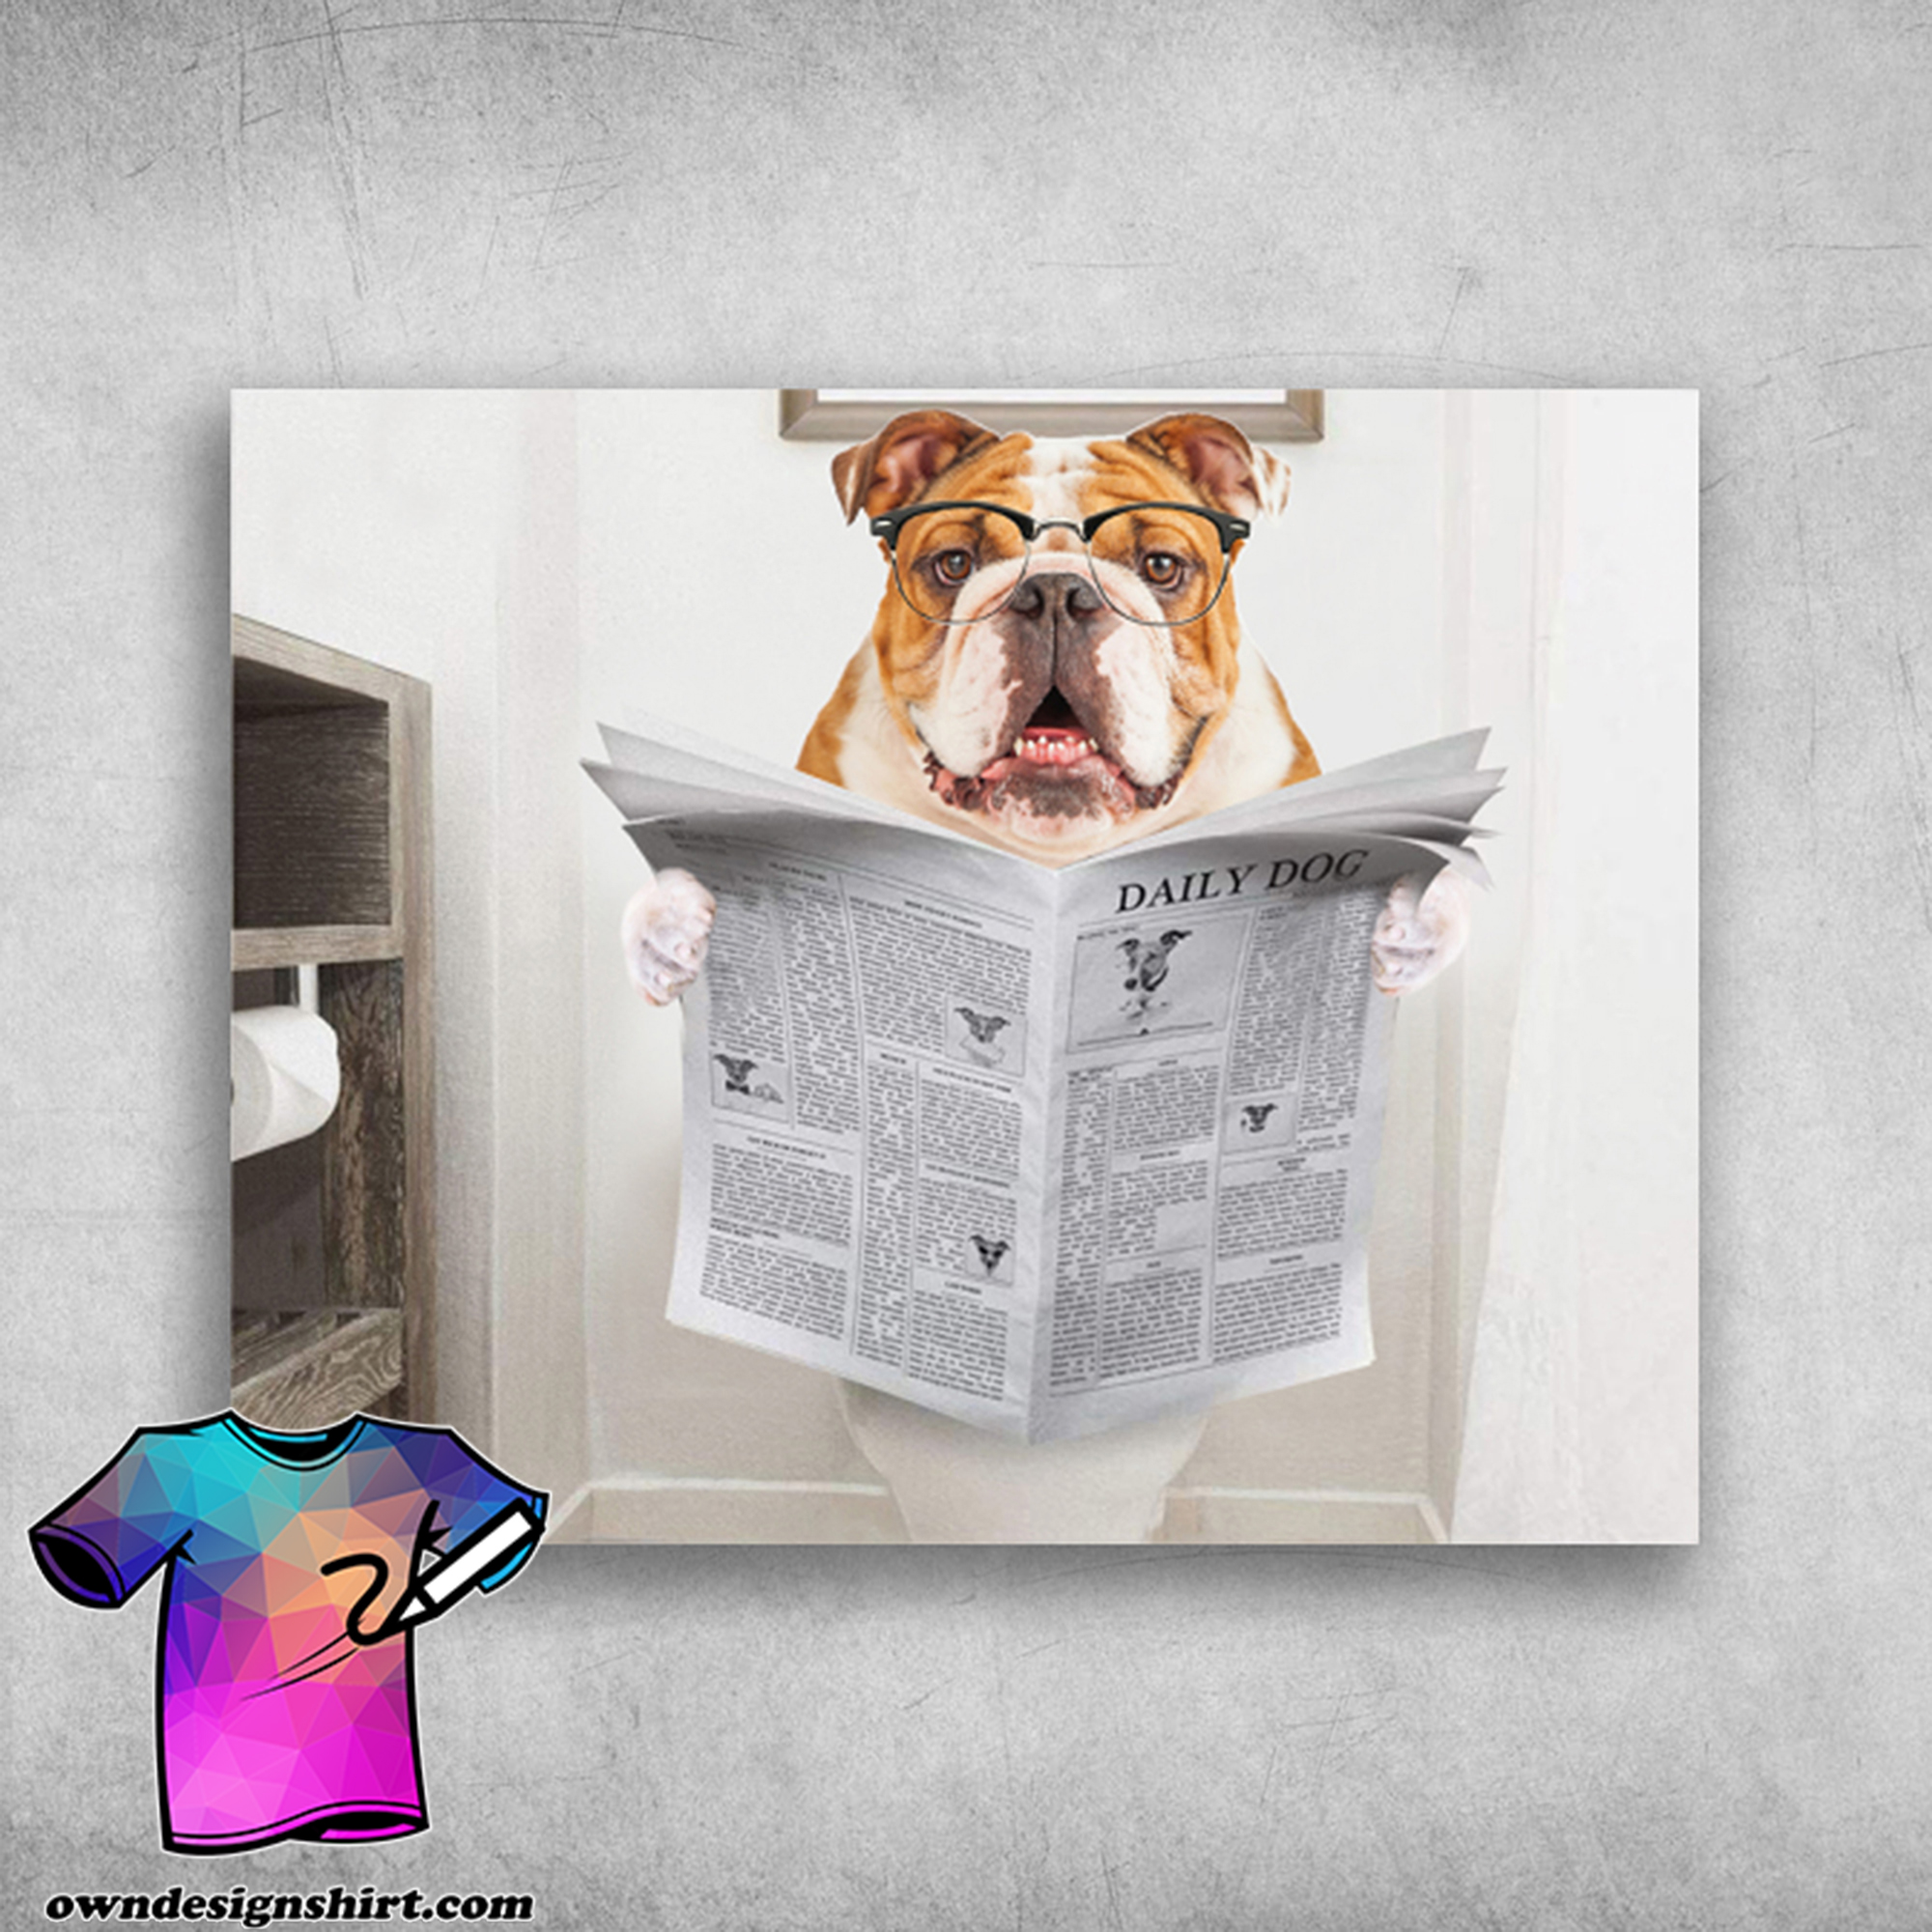 English bulldog read newspaper daily dog poster